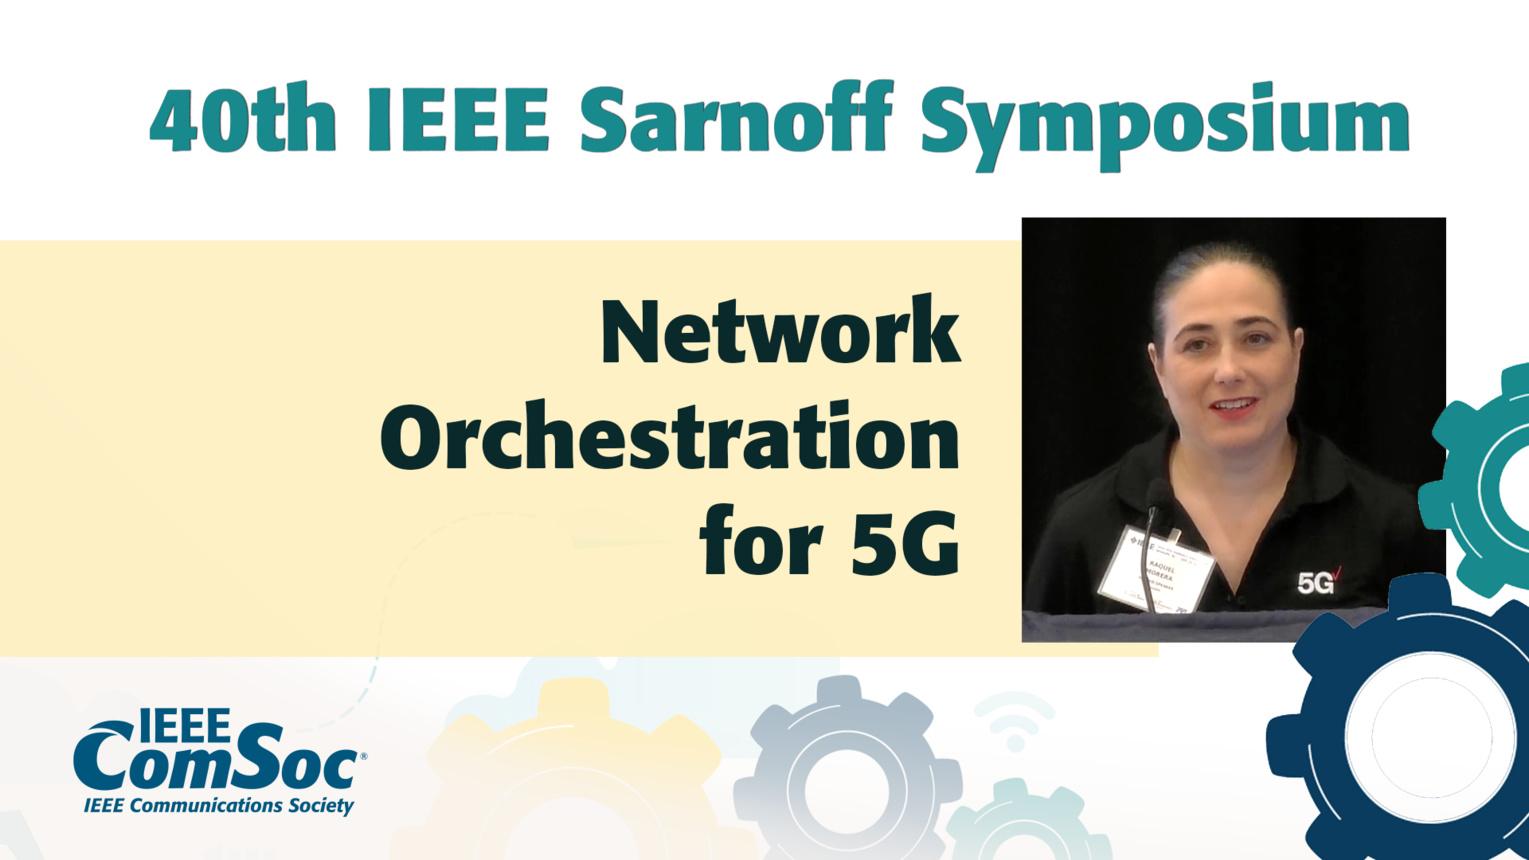 Network Orchestration for 5G - Raquel Morera - IEEE Sarnoff Symposium, 2019